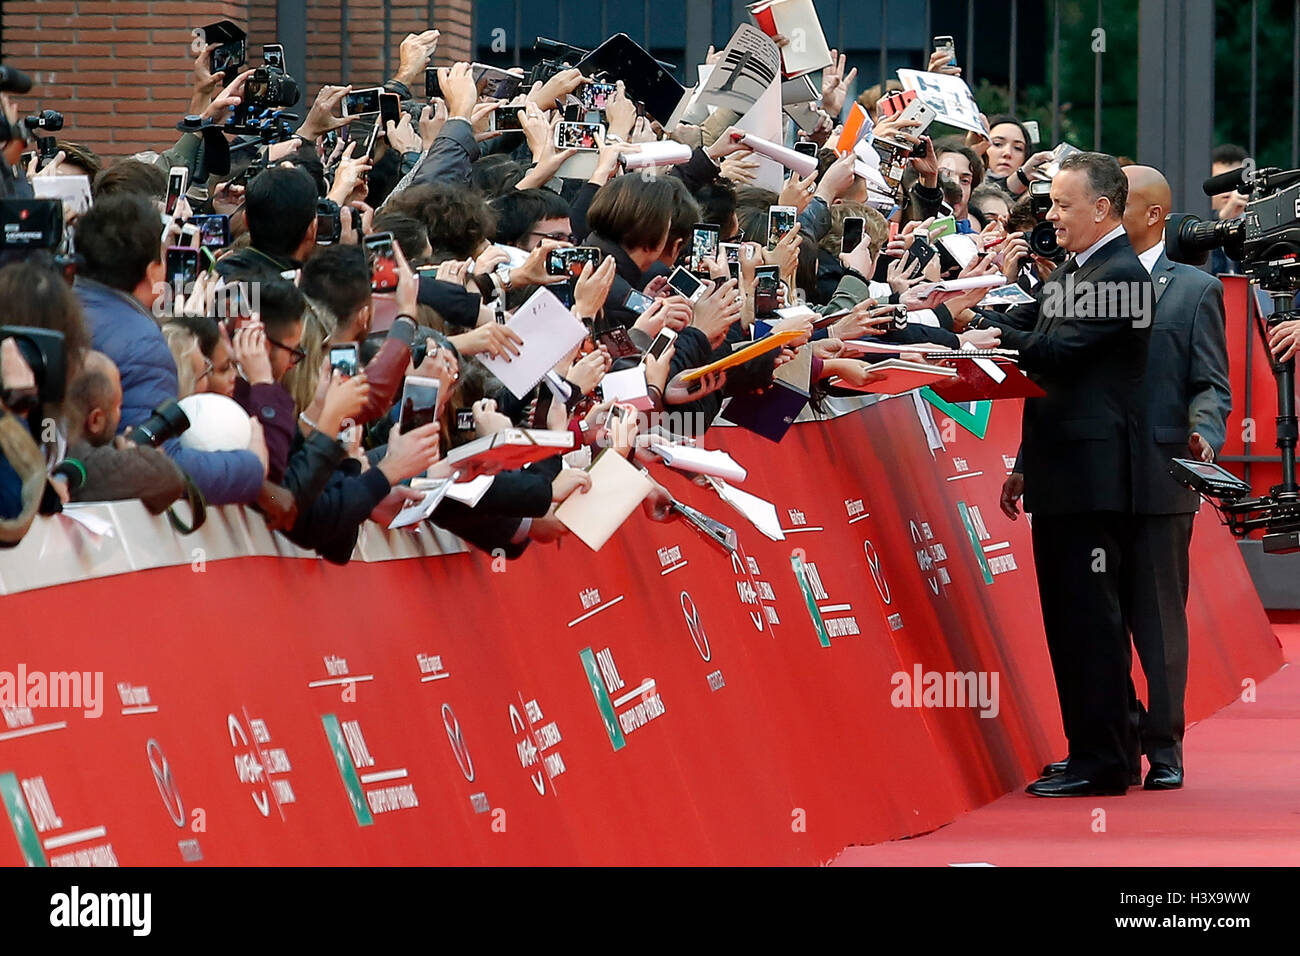 Tom Hanks Roma 13 ottobre 2016. Roma Film Fest XI edizione. Foto di Samantha Zucchi Insidefoto Credito: insidefoto Foto Stock